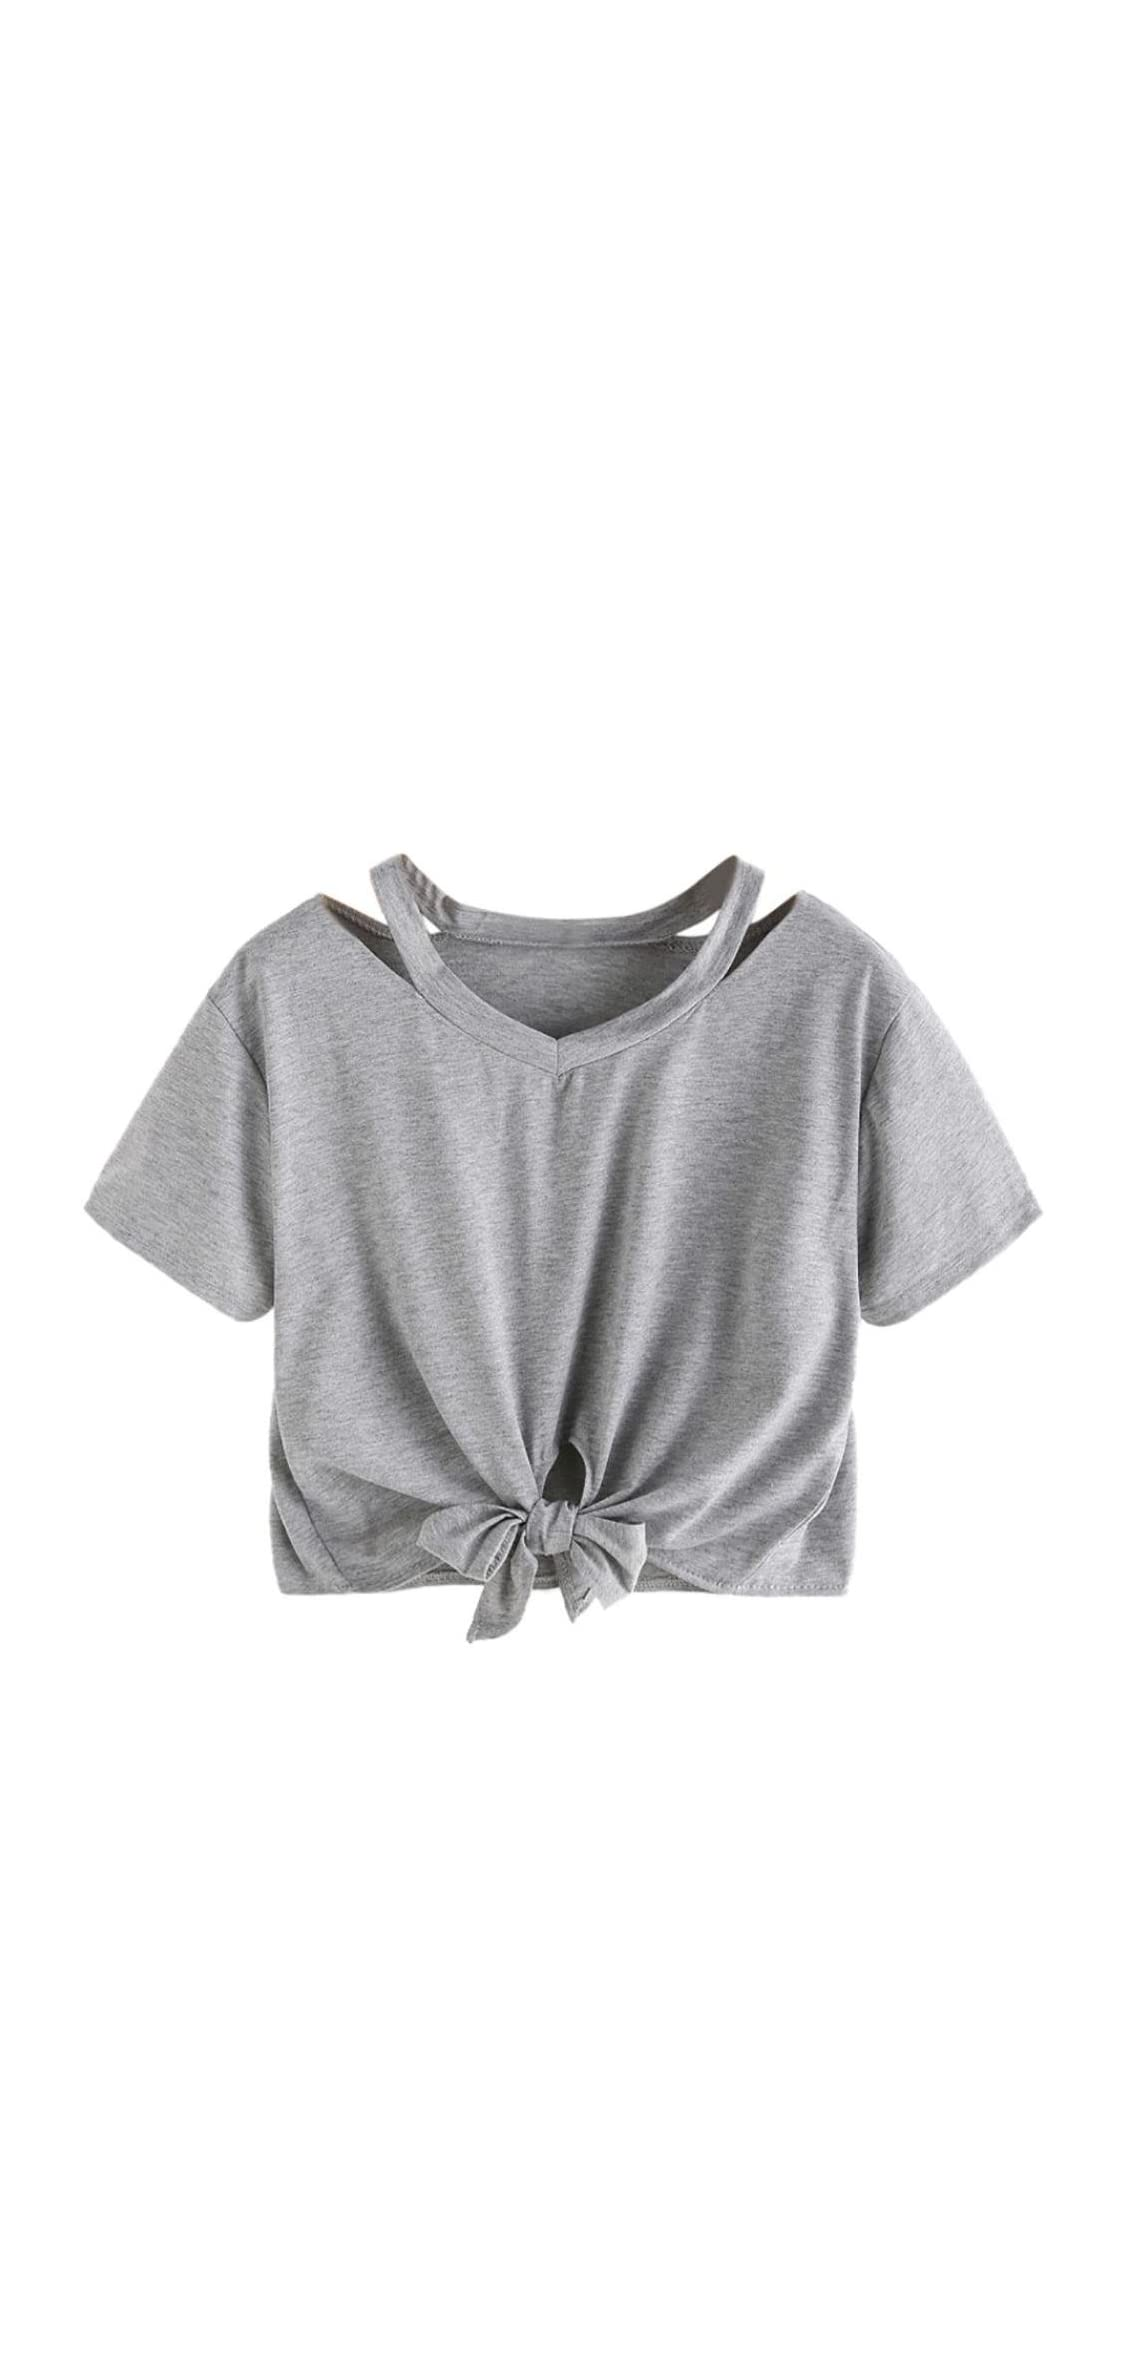 Women Cute T-shirt Bow Long Sleeve Hollow Out V-neck